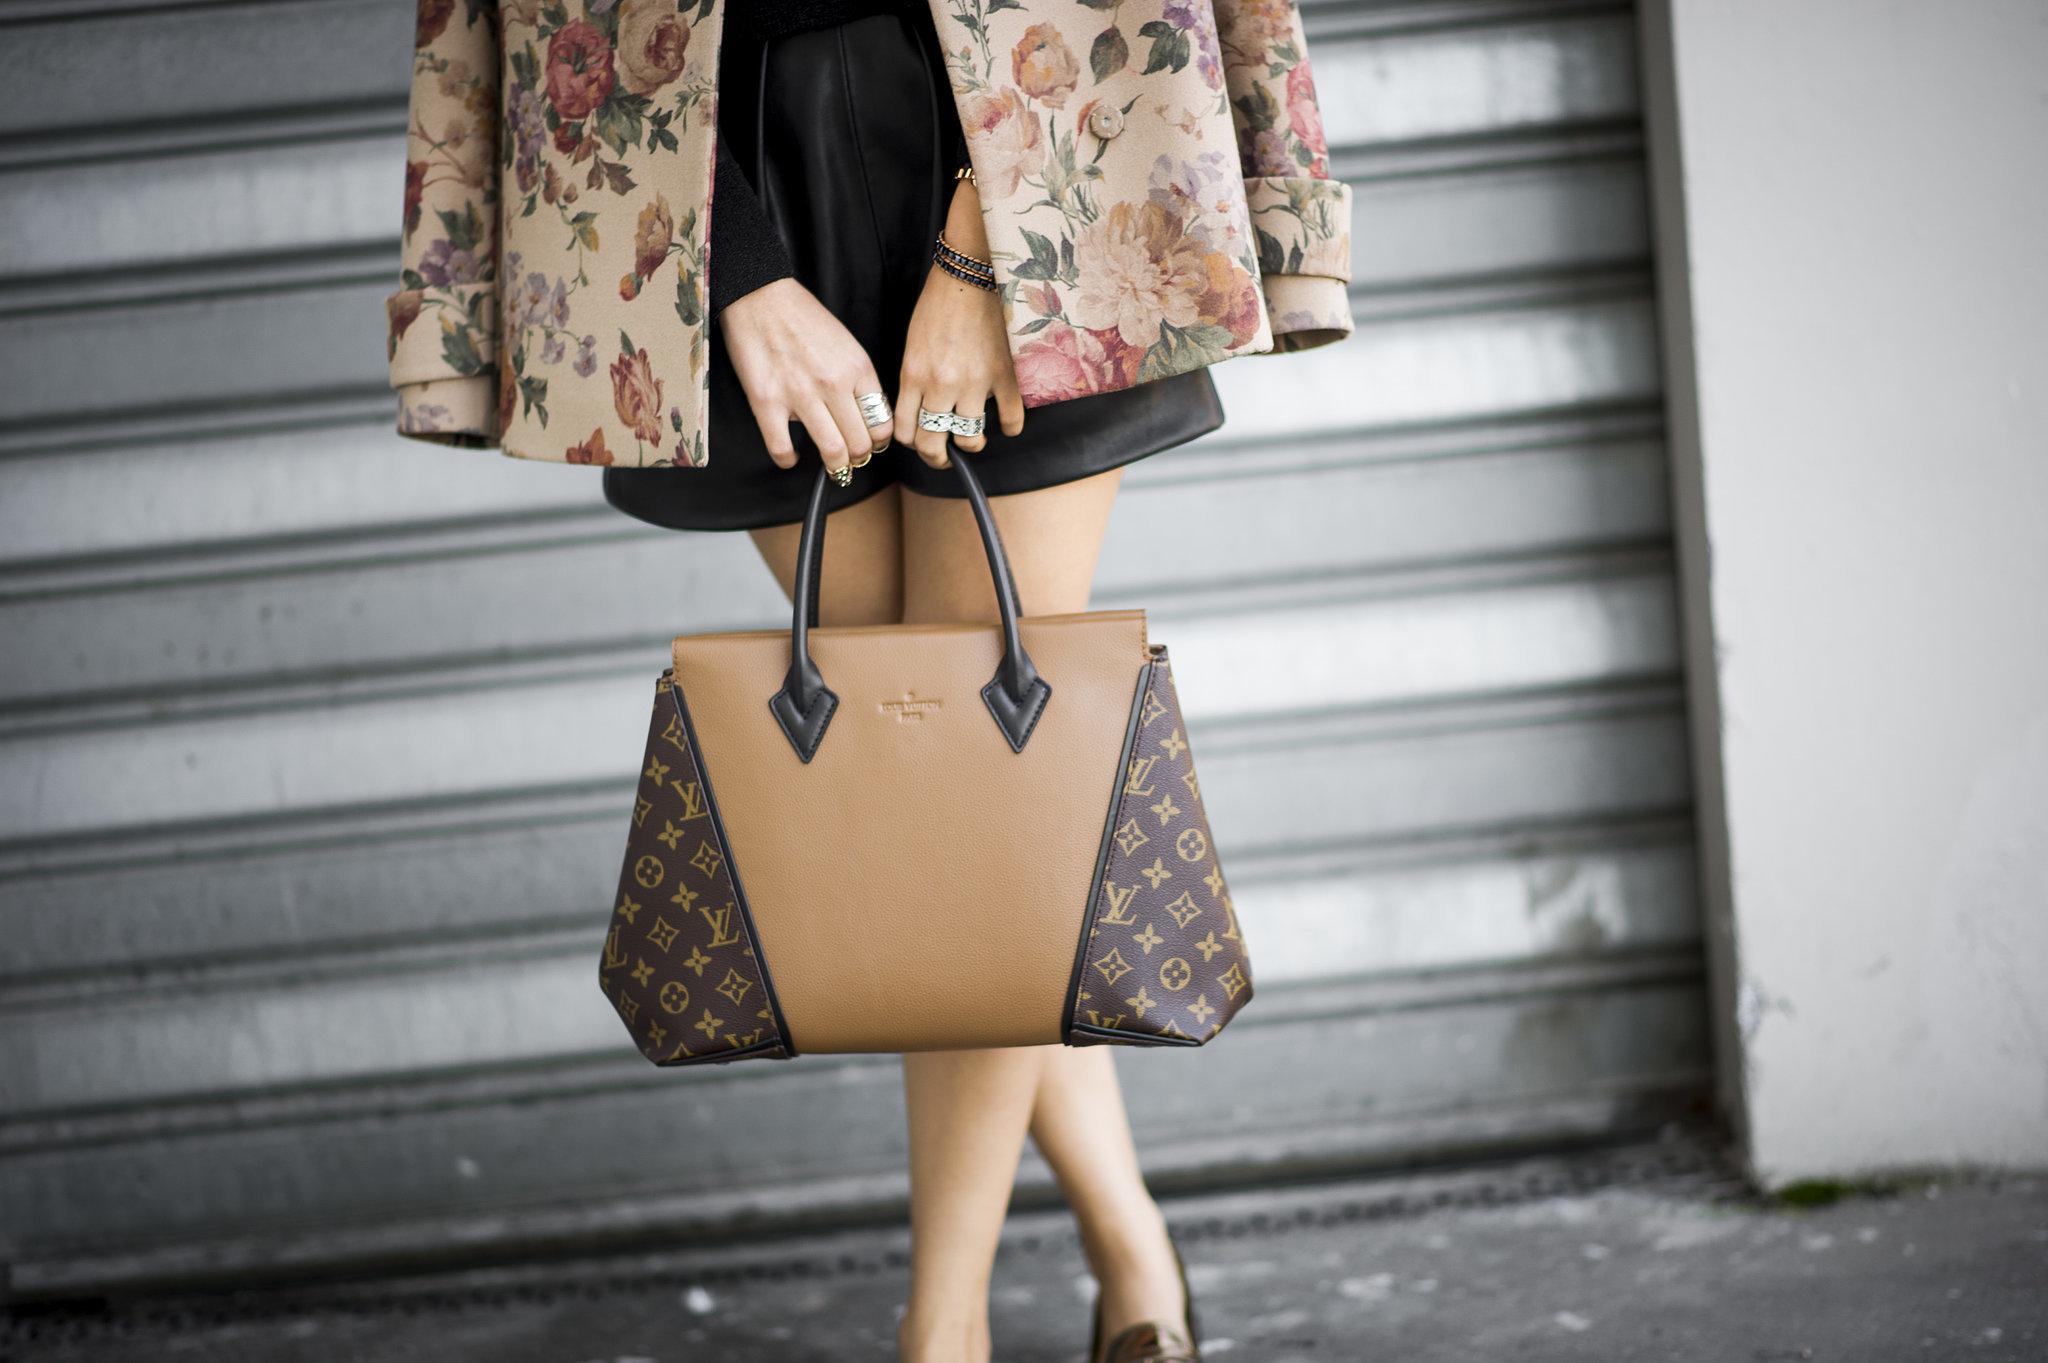 Right-Bag